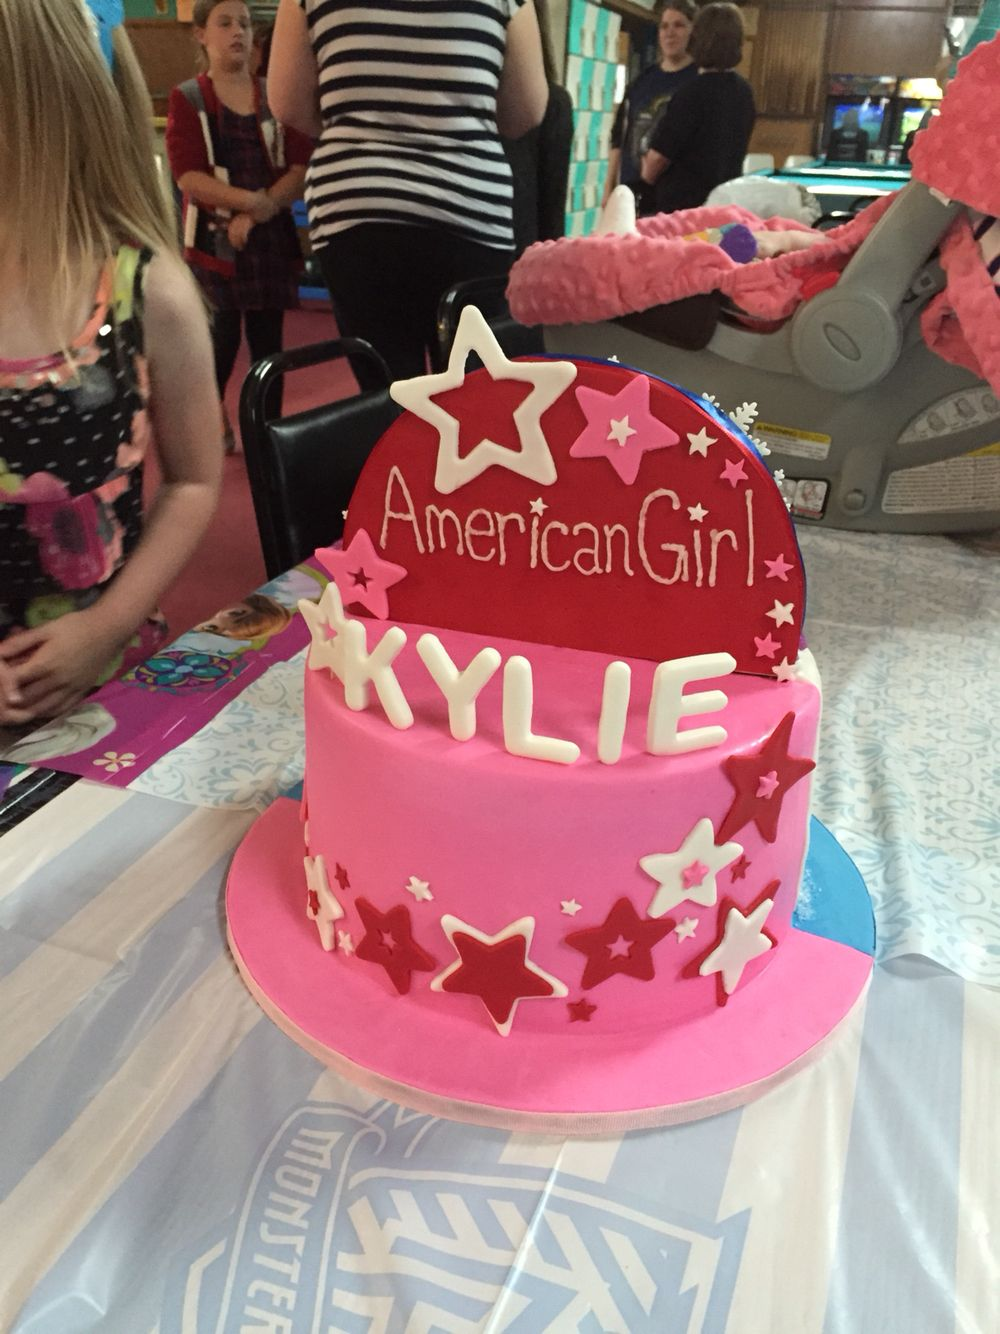 Tremendous American Girl Cake American Girl Birthday American Girl Cakes Birthday Cards Printable Opercafe Filternl